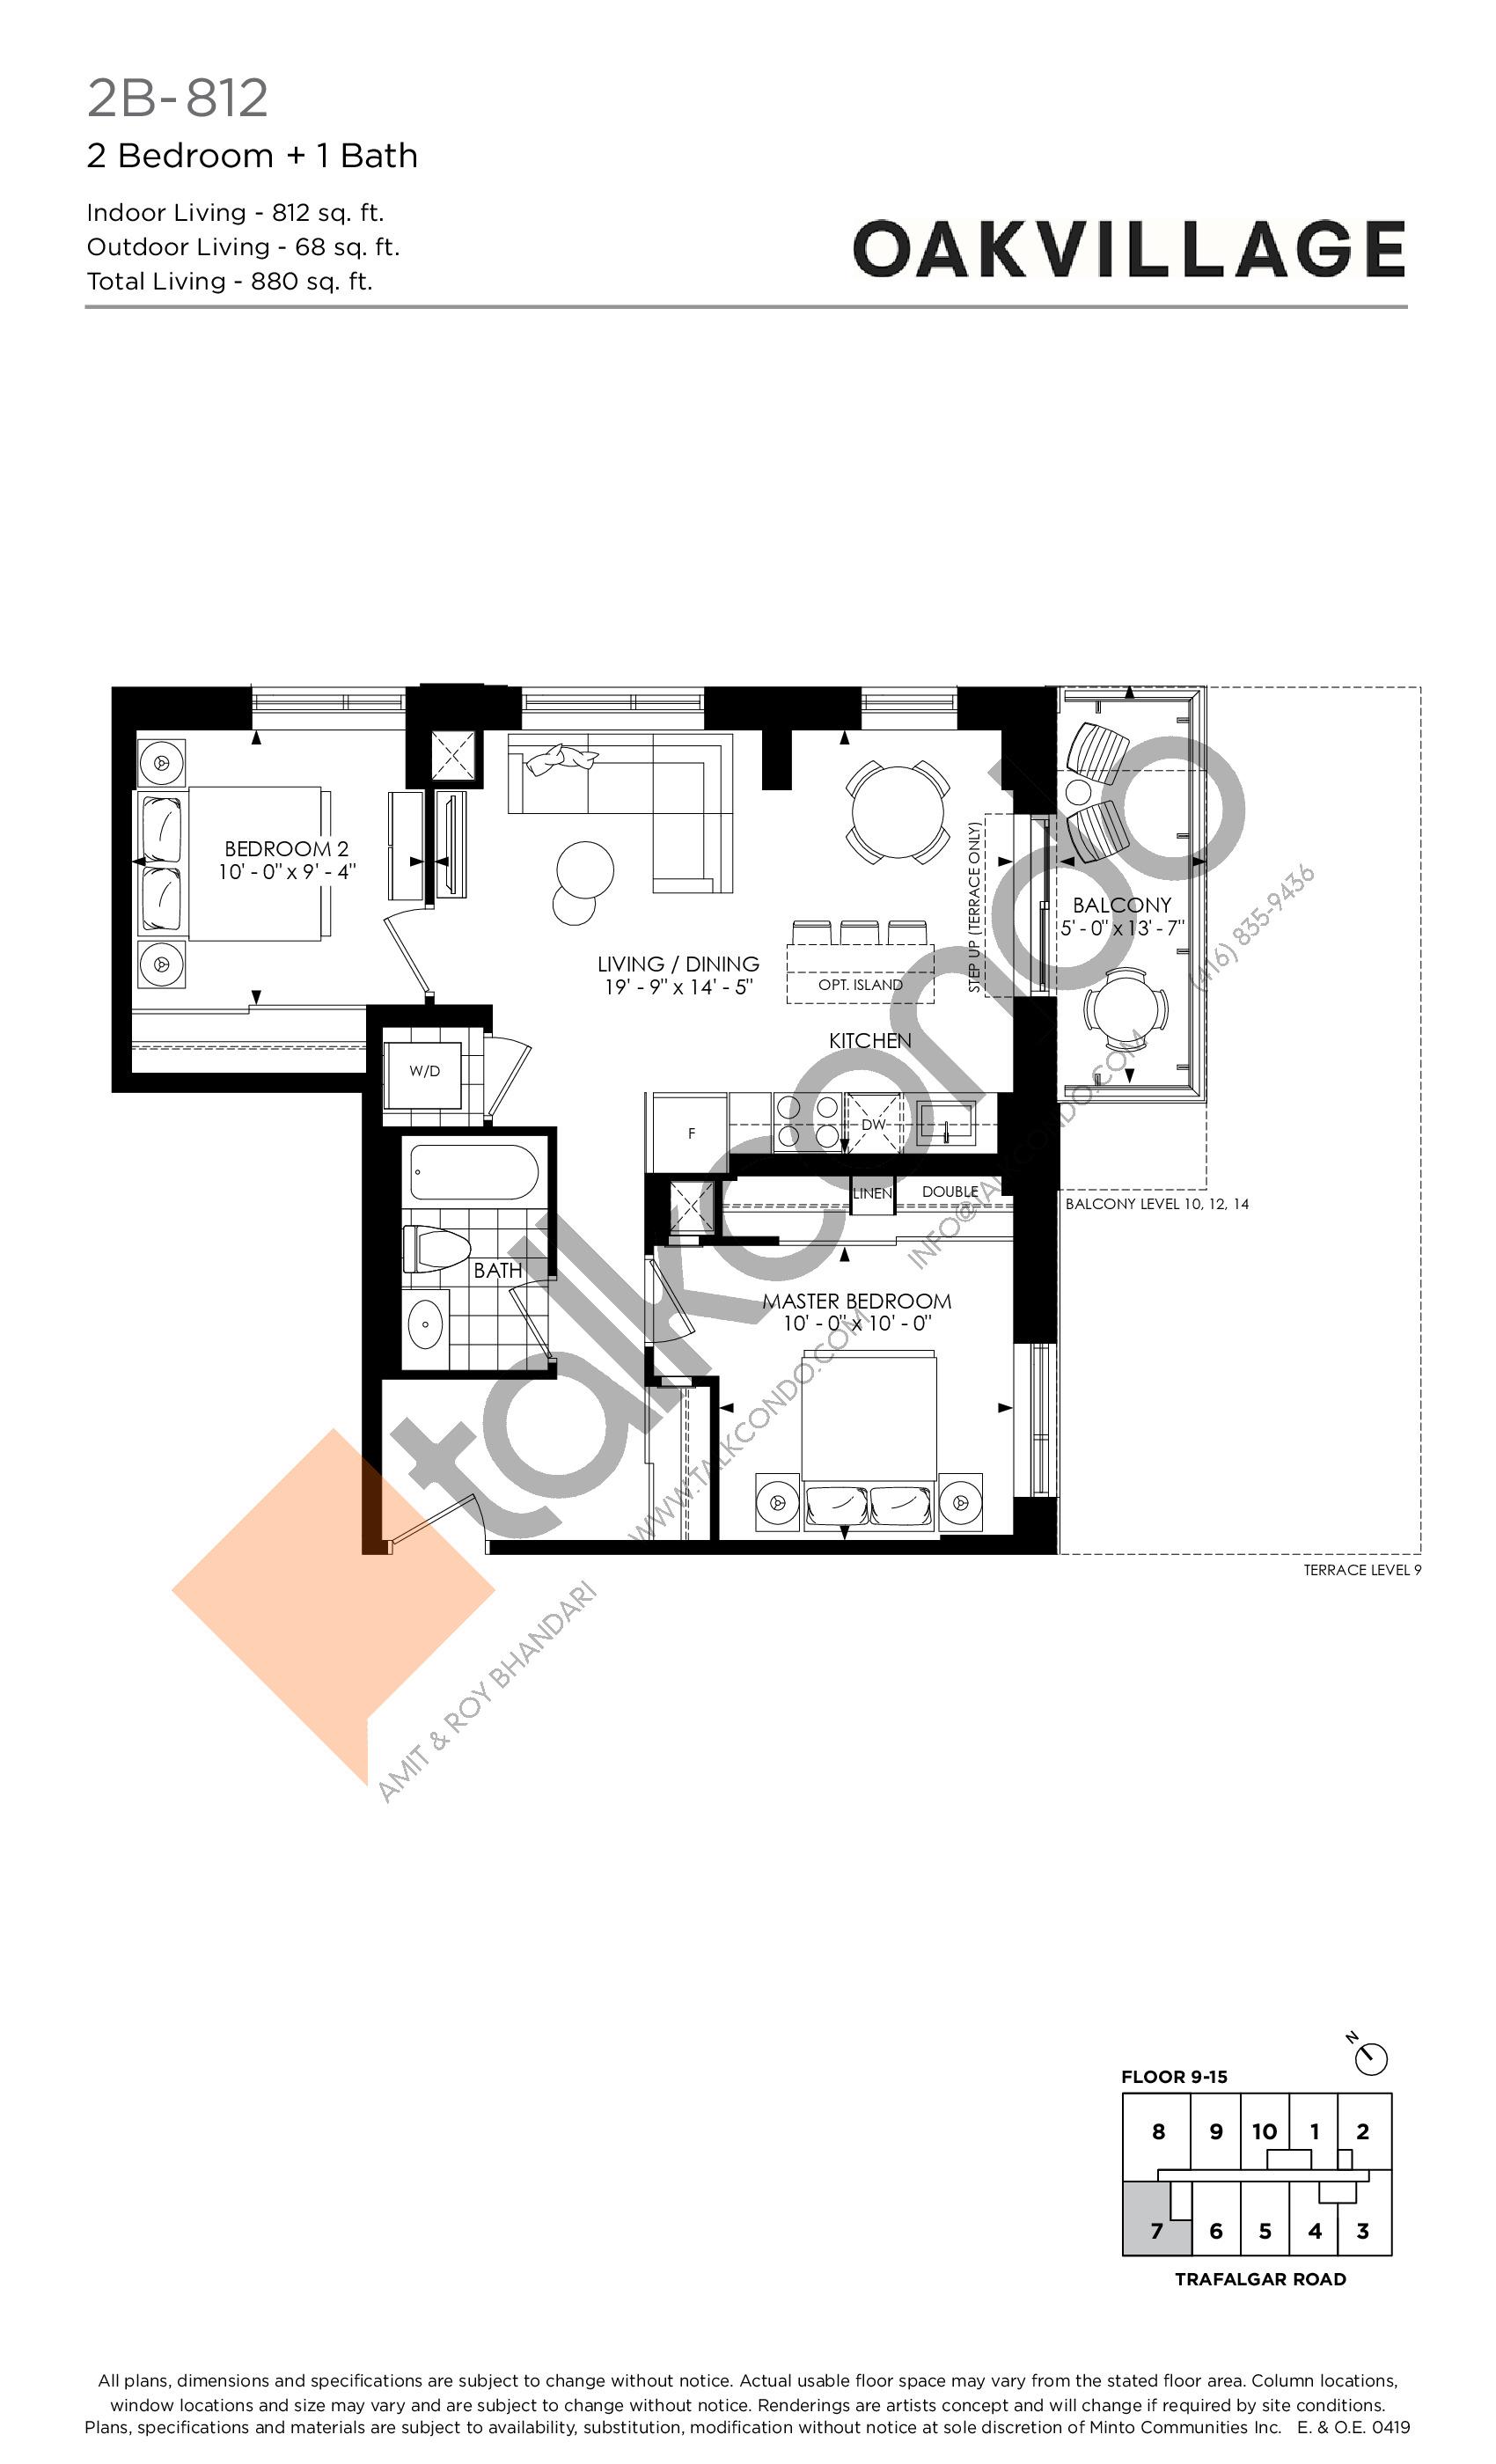 2B-812 Floor Plan at Minto Oakvillage Condos 1 - 812 sq.ft